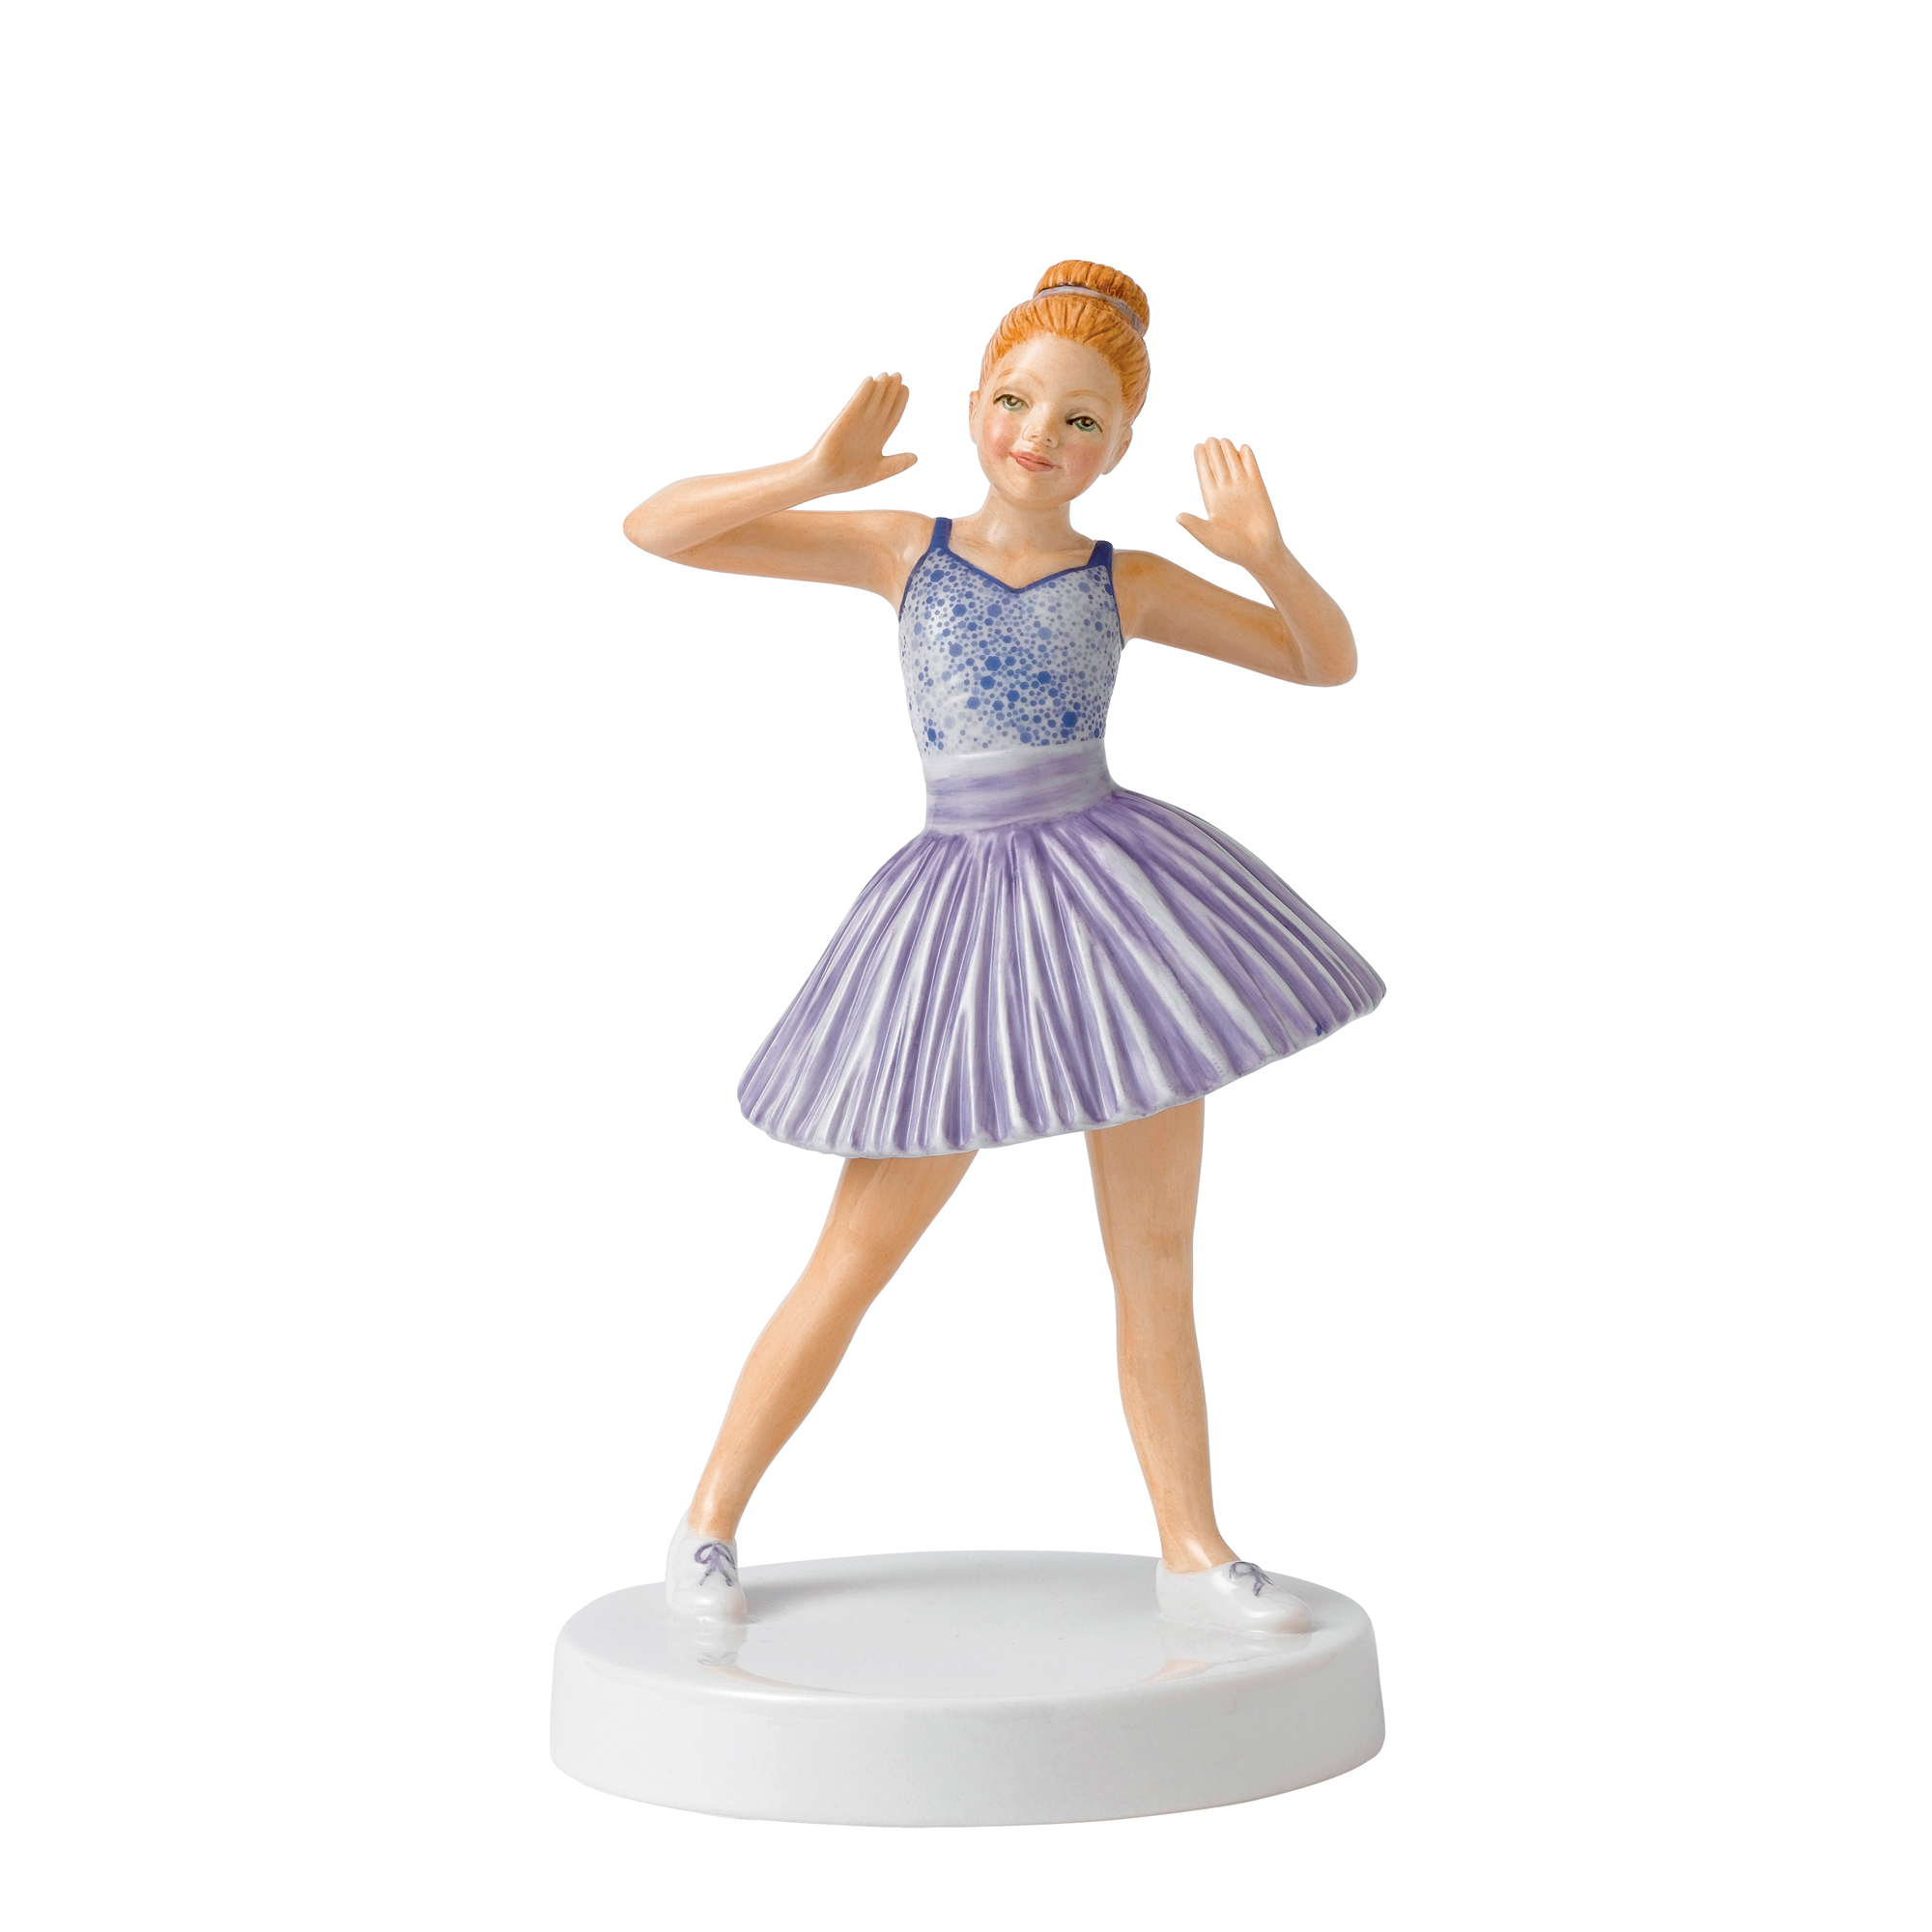 Jazz Dancer HN5791 - Royal Doulton Figurine